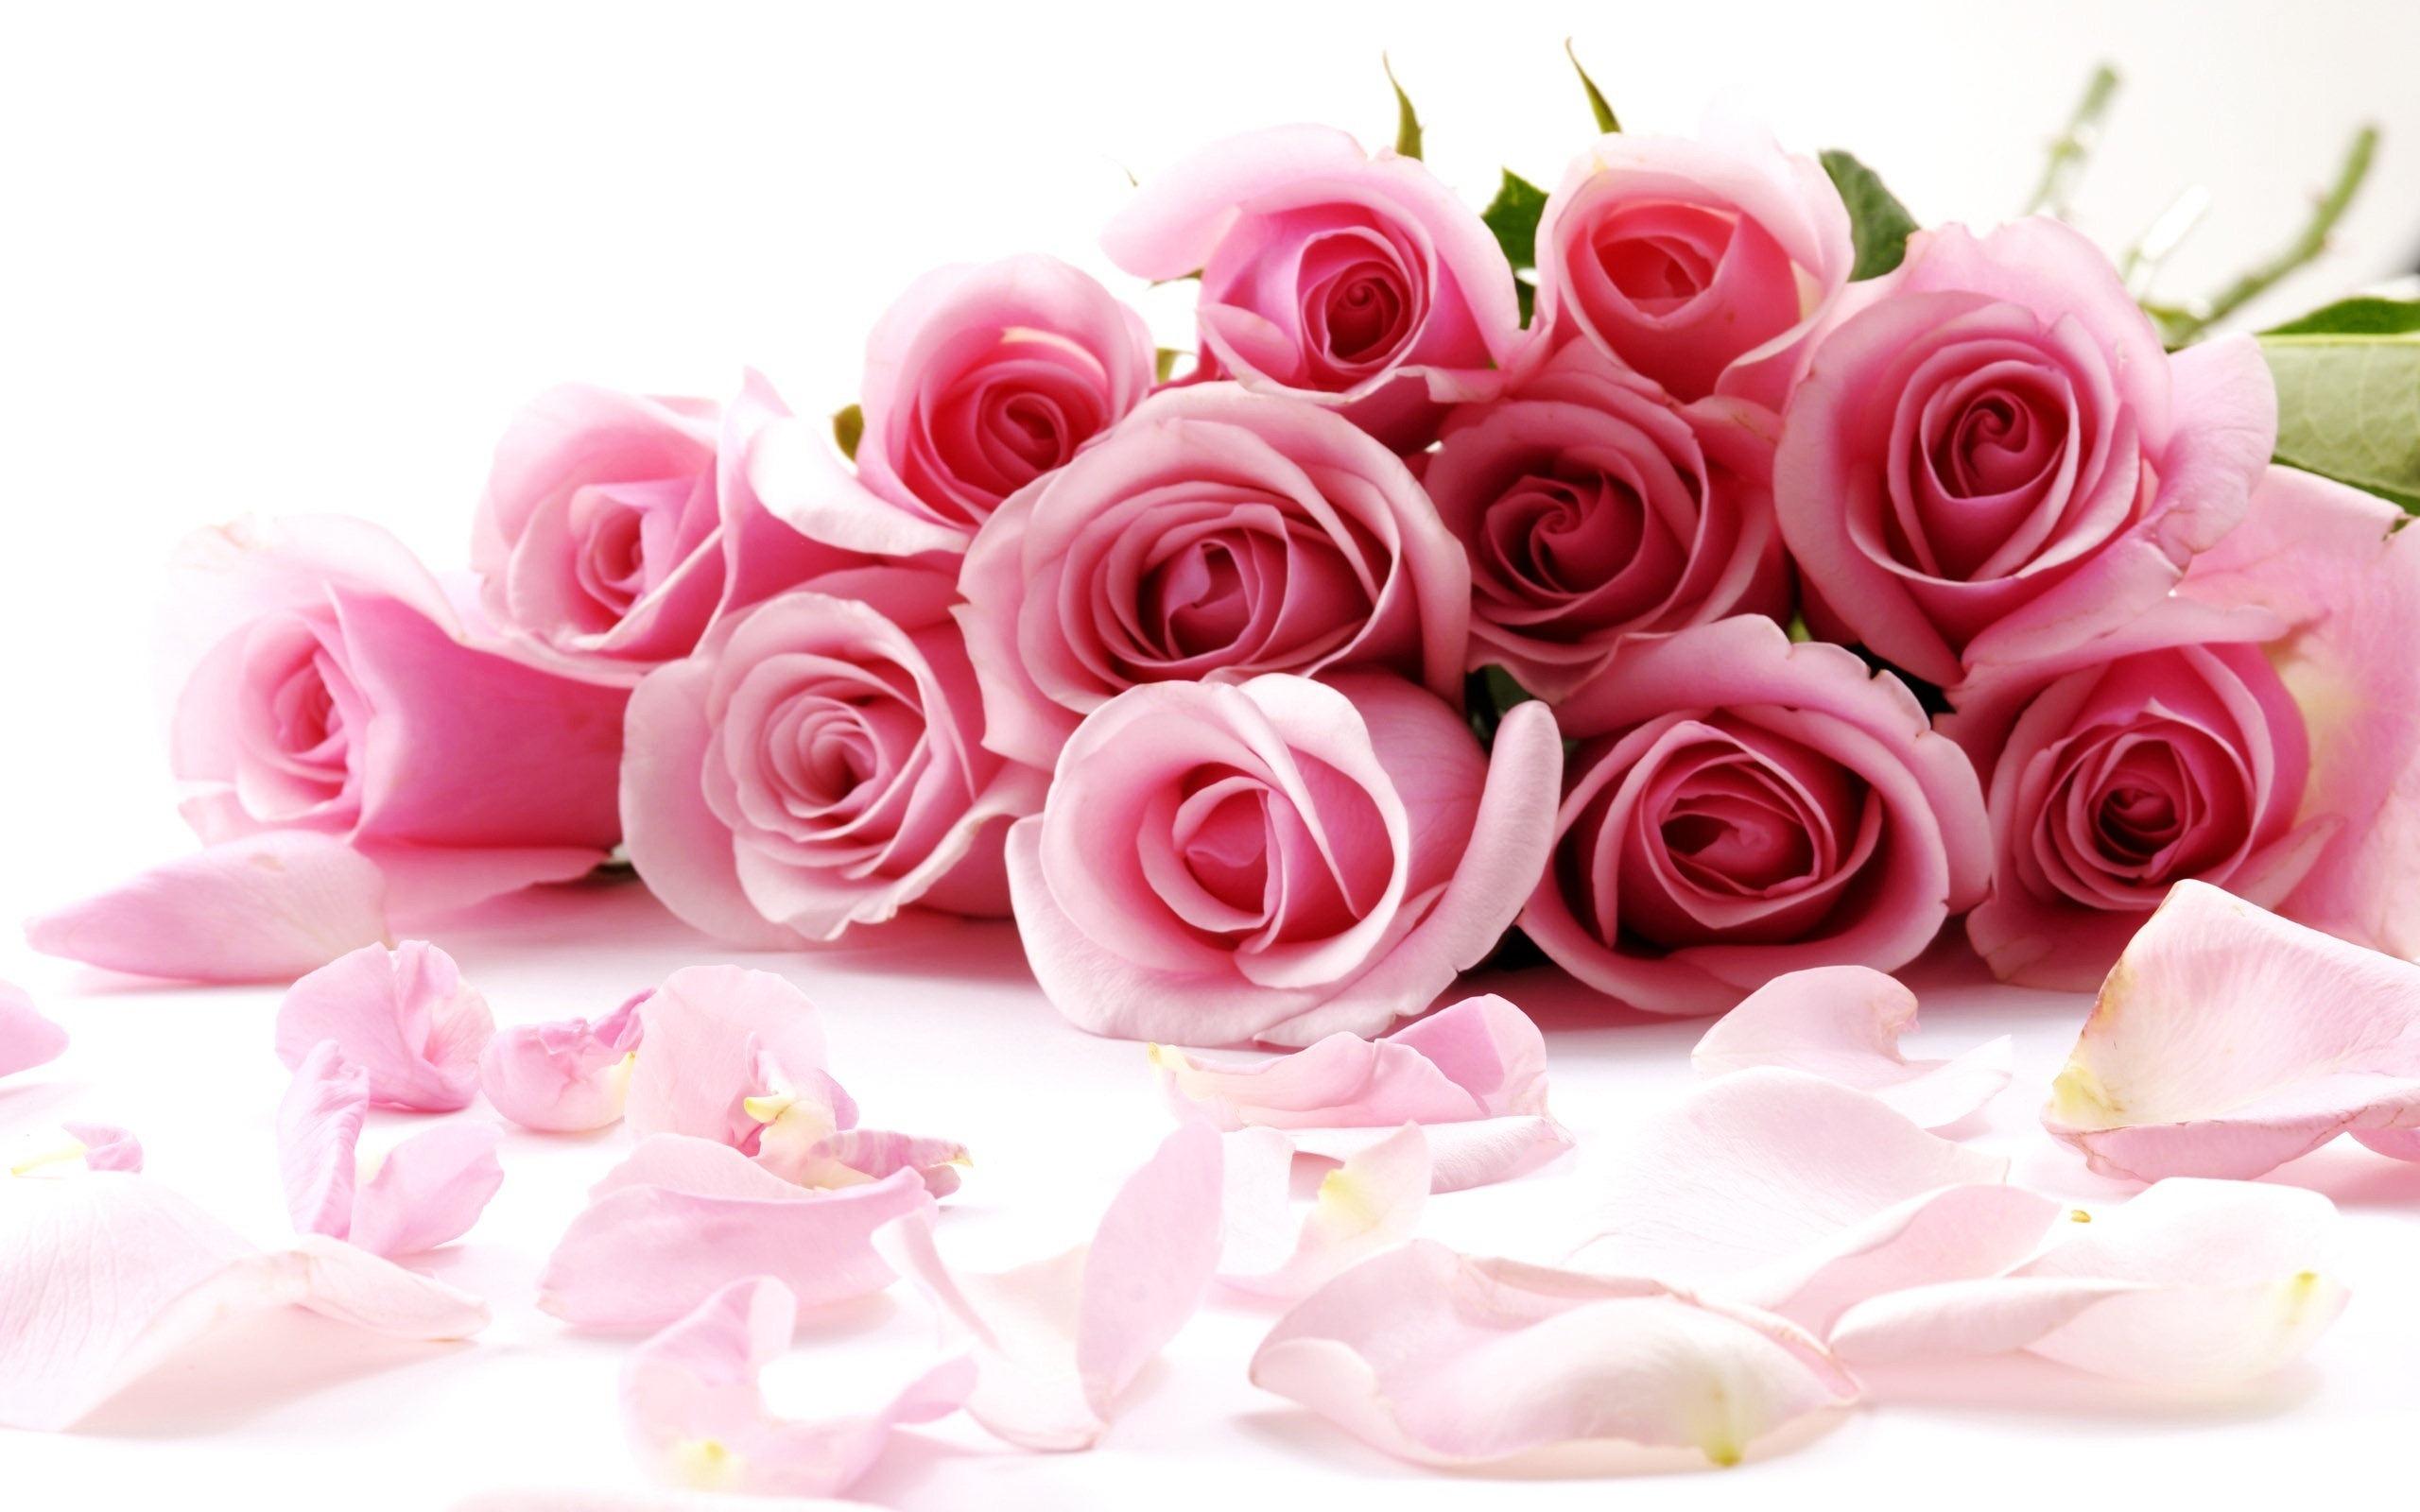 VALENTINE 2017: Kisah Tragis di Balik Perayaan Cinta Hari Valentine